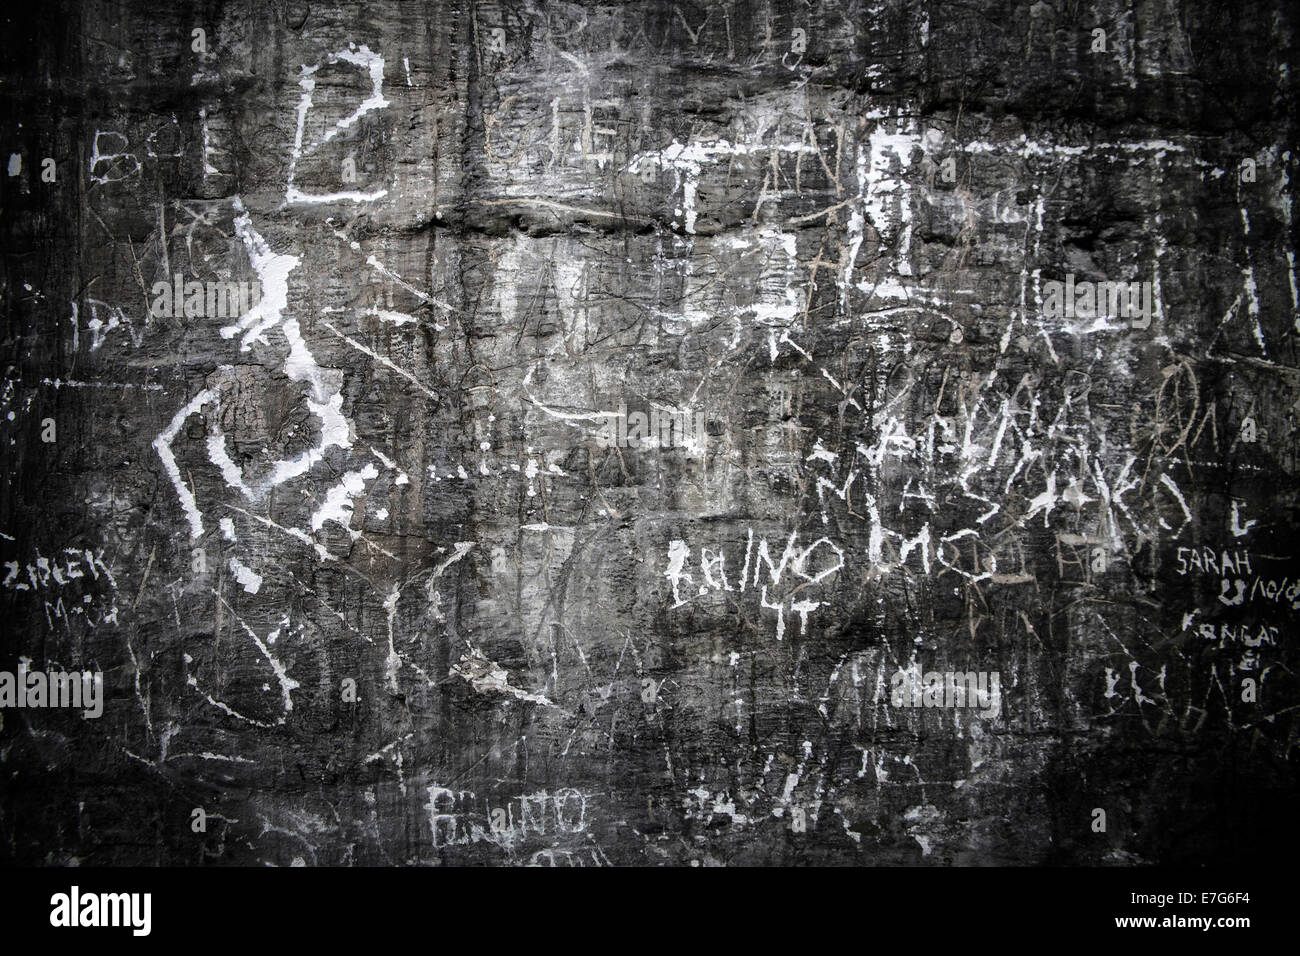 Graffiti, gas chamber, Auschwitz I extermination camp, Oswiecim, Poland, Oswiecim, Poland - Stock Image